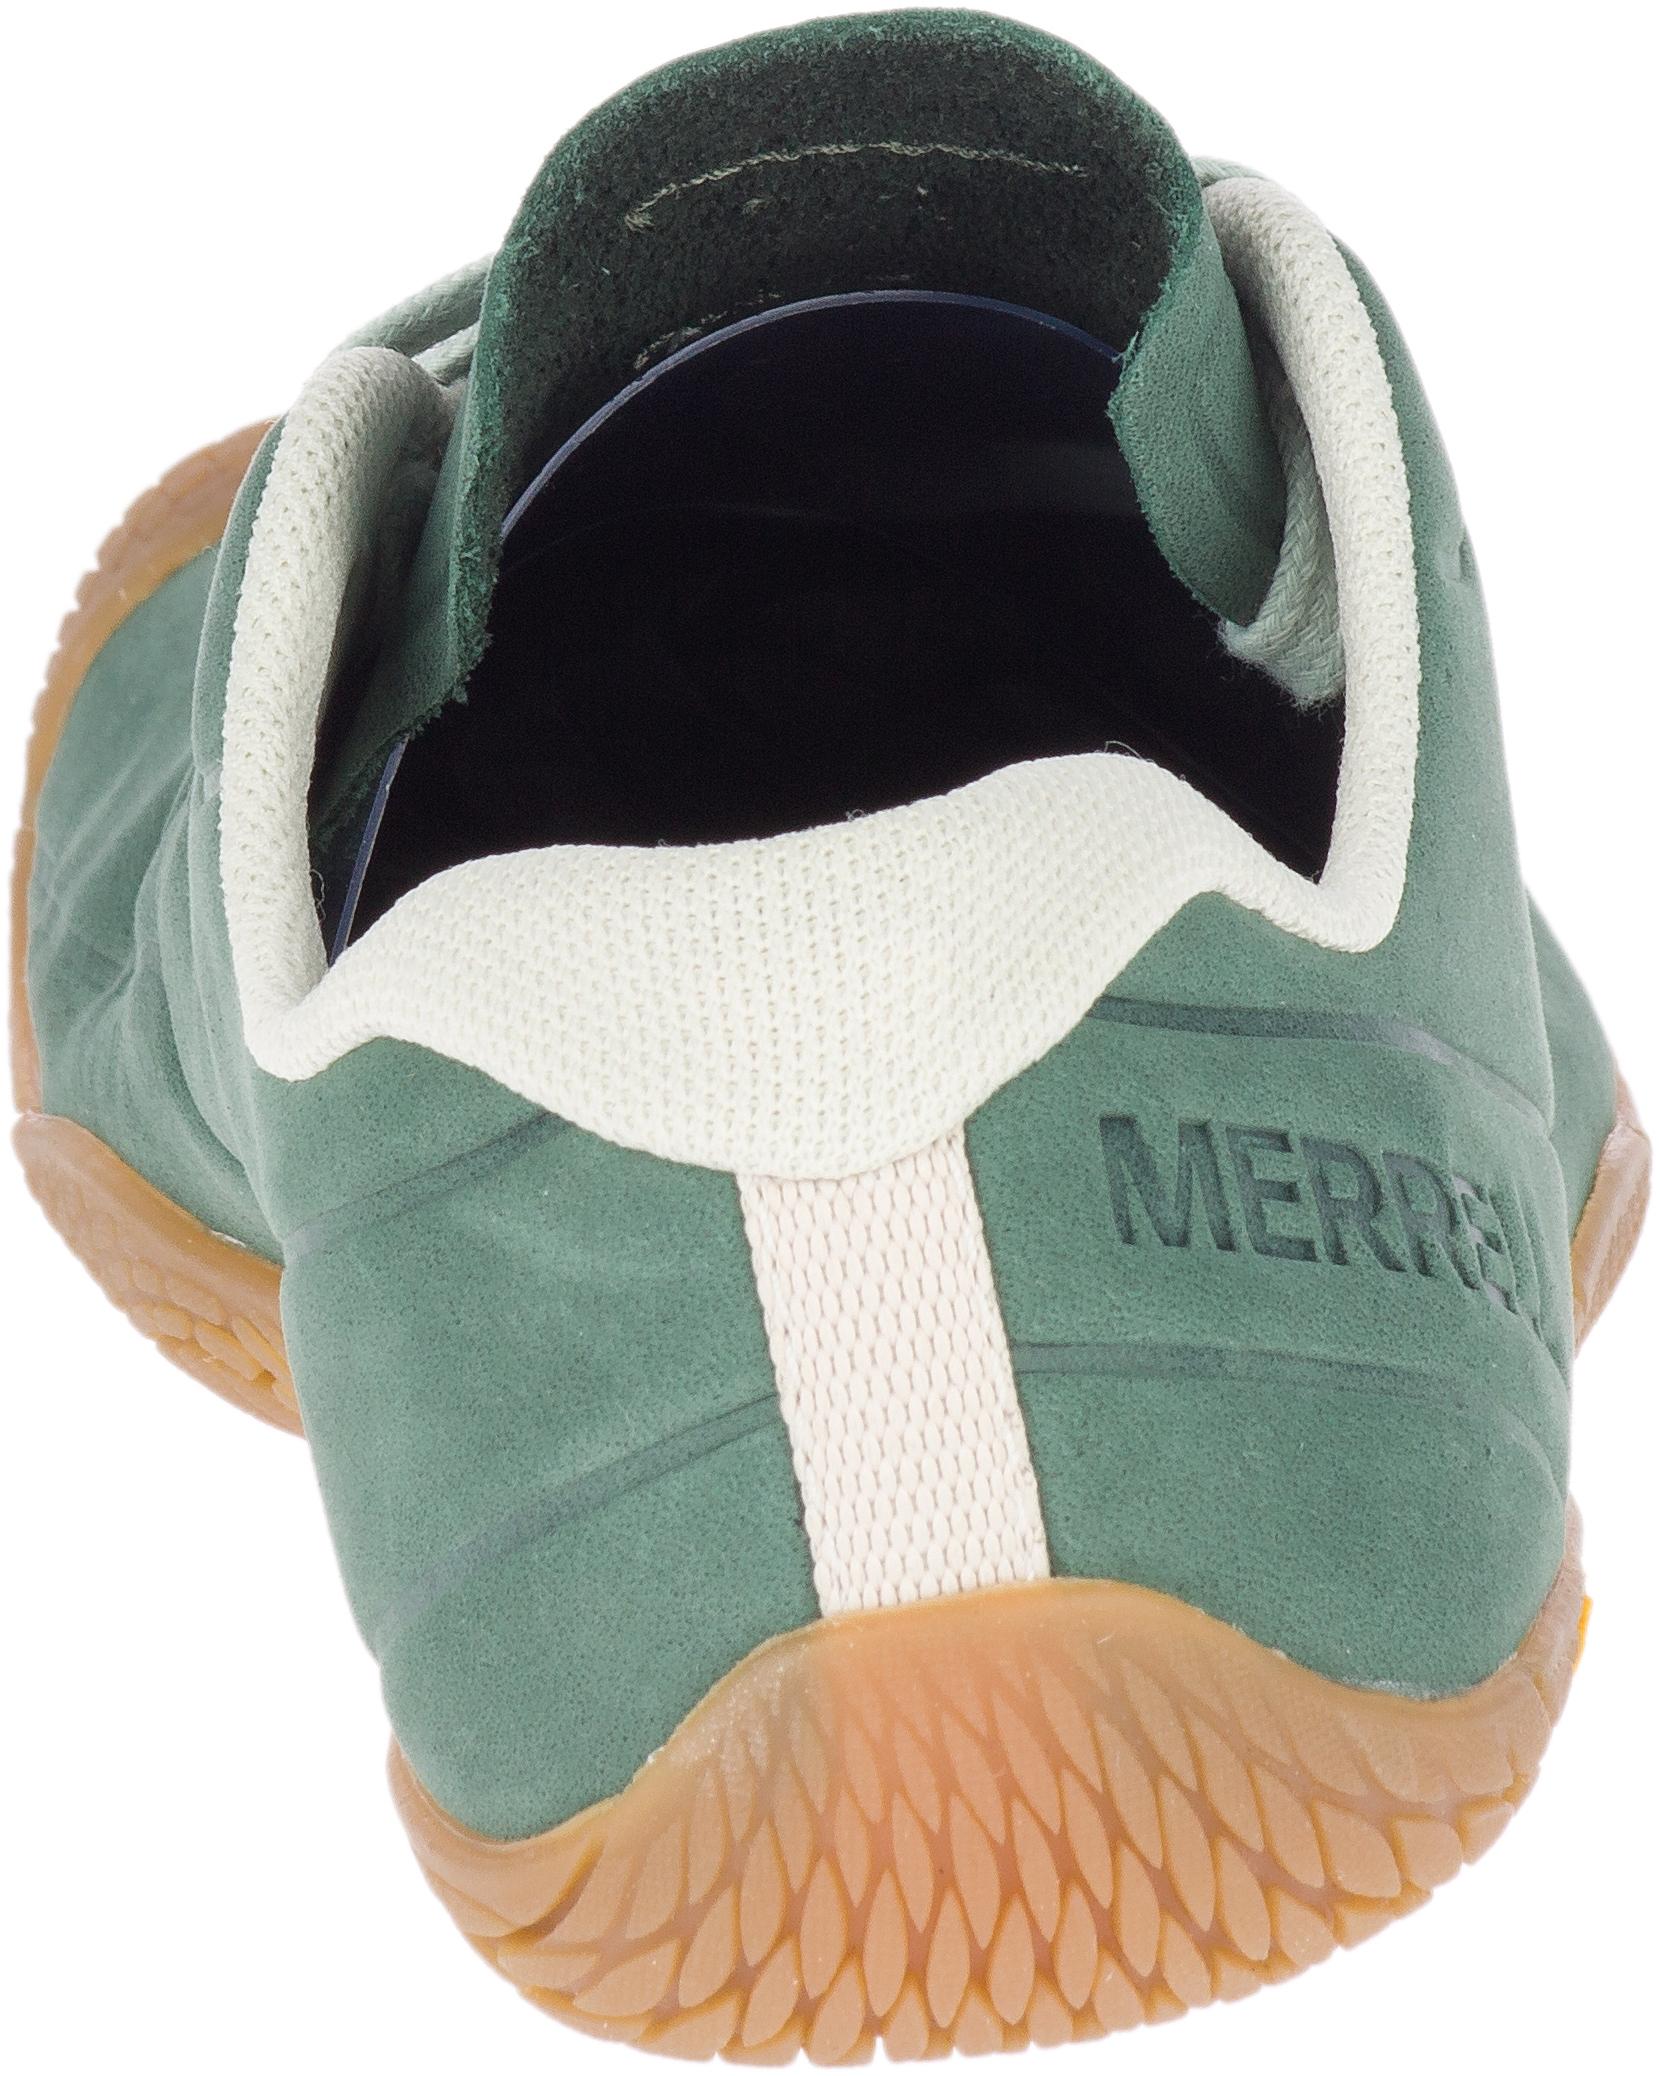 Vapor Glove Luna 3 Leather, Laurel